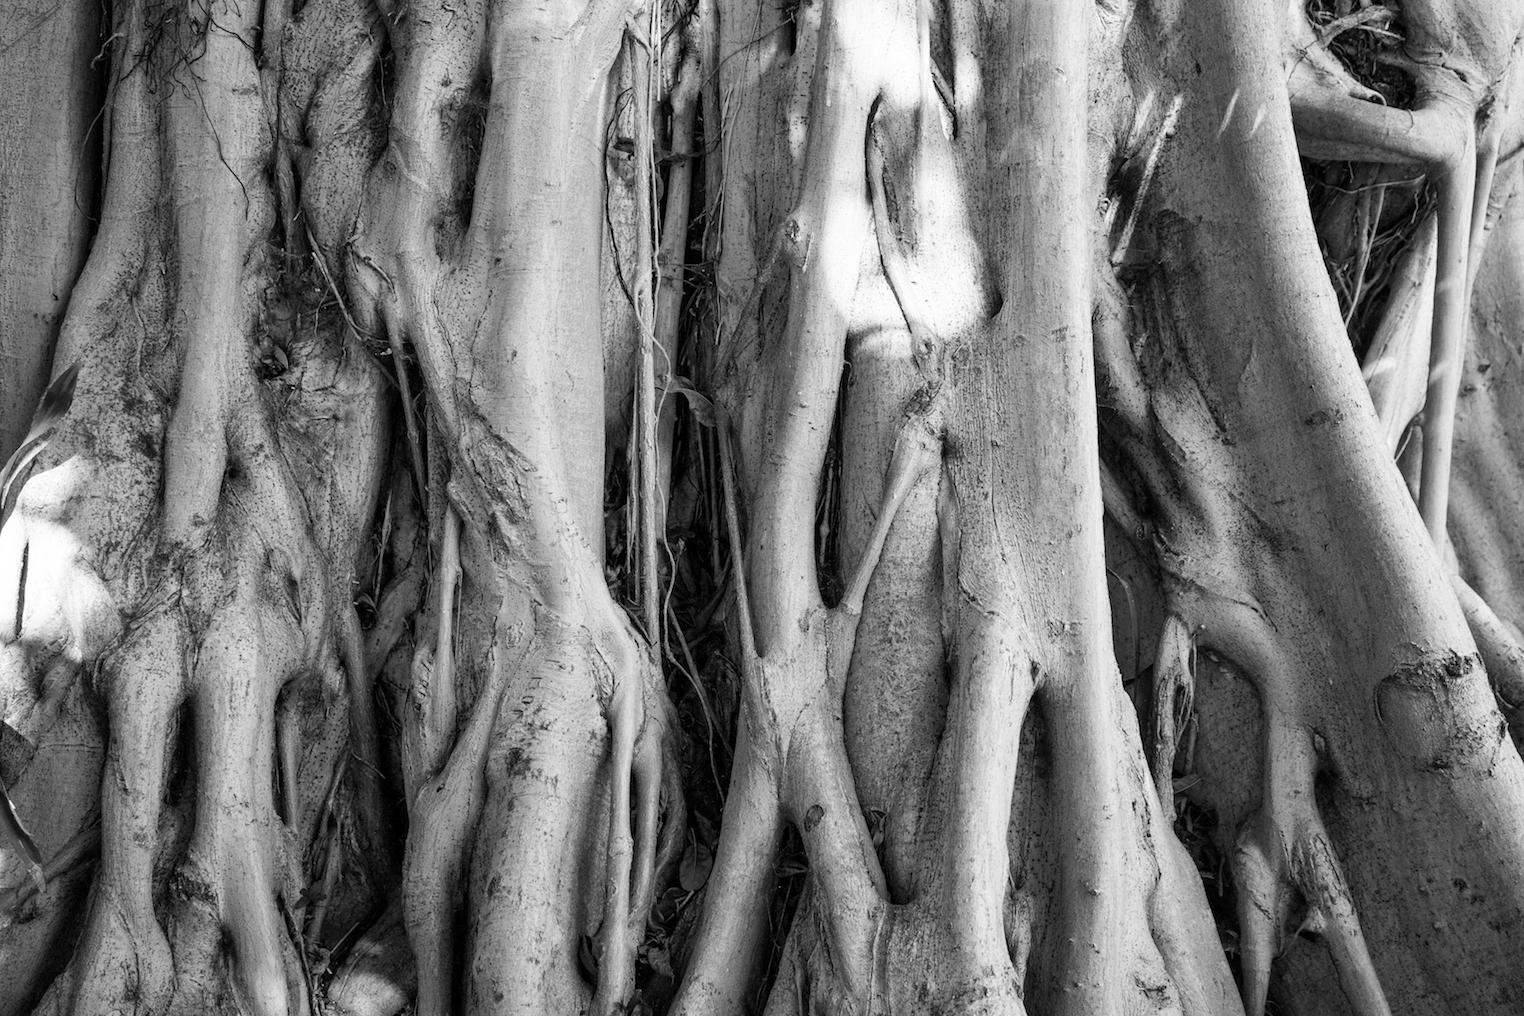 Ficus Tree Root, Huntington Tropical Garden, Pasadena, California.Photo by  Sally Krueger-Wyman.